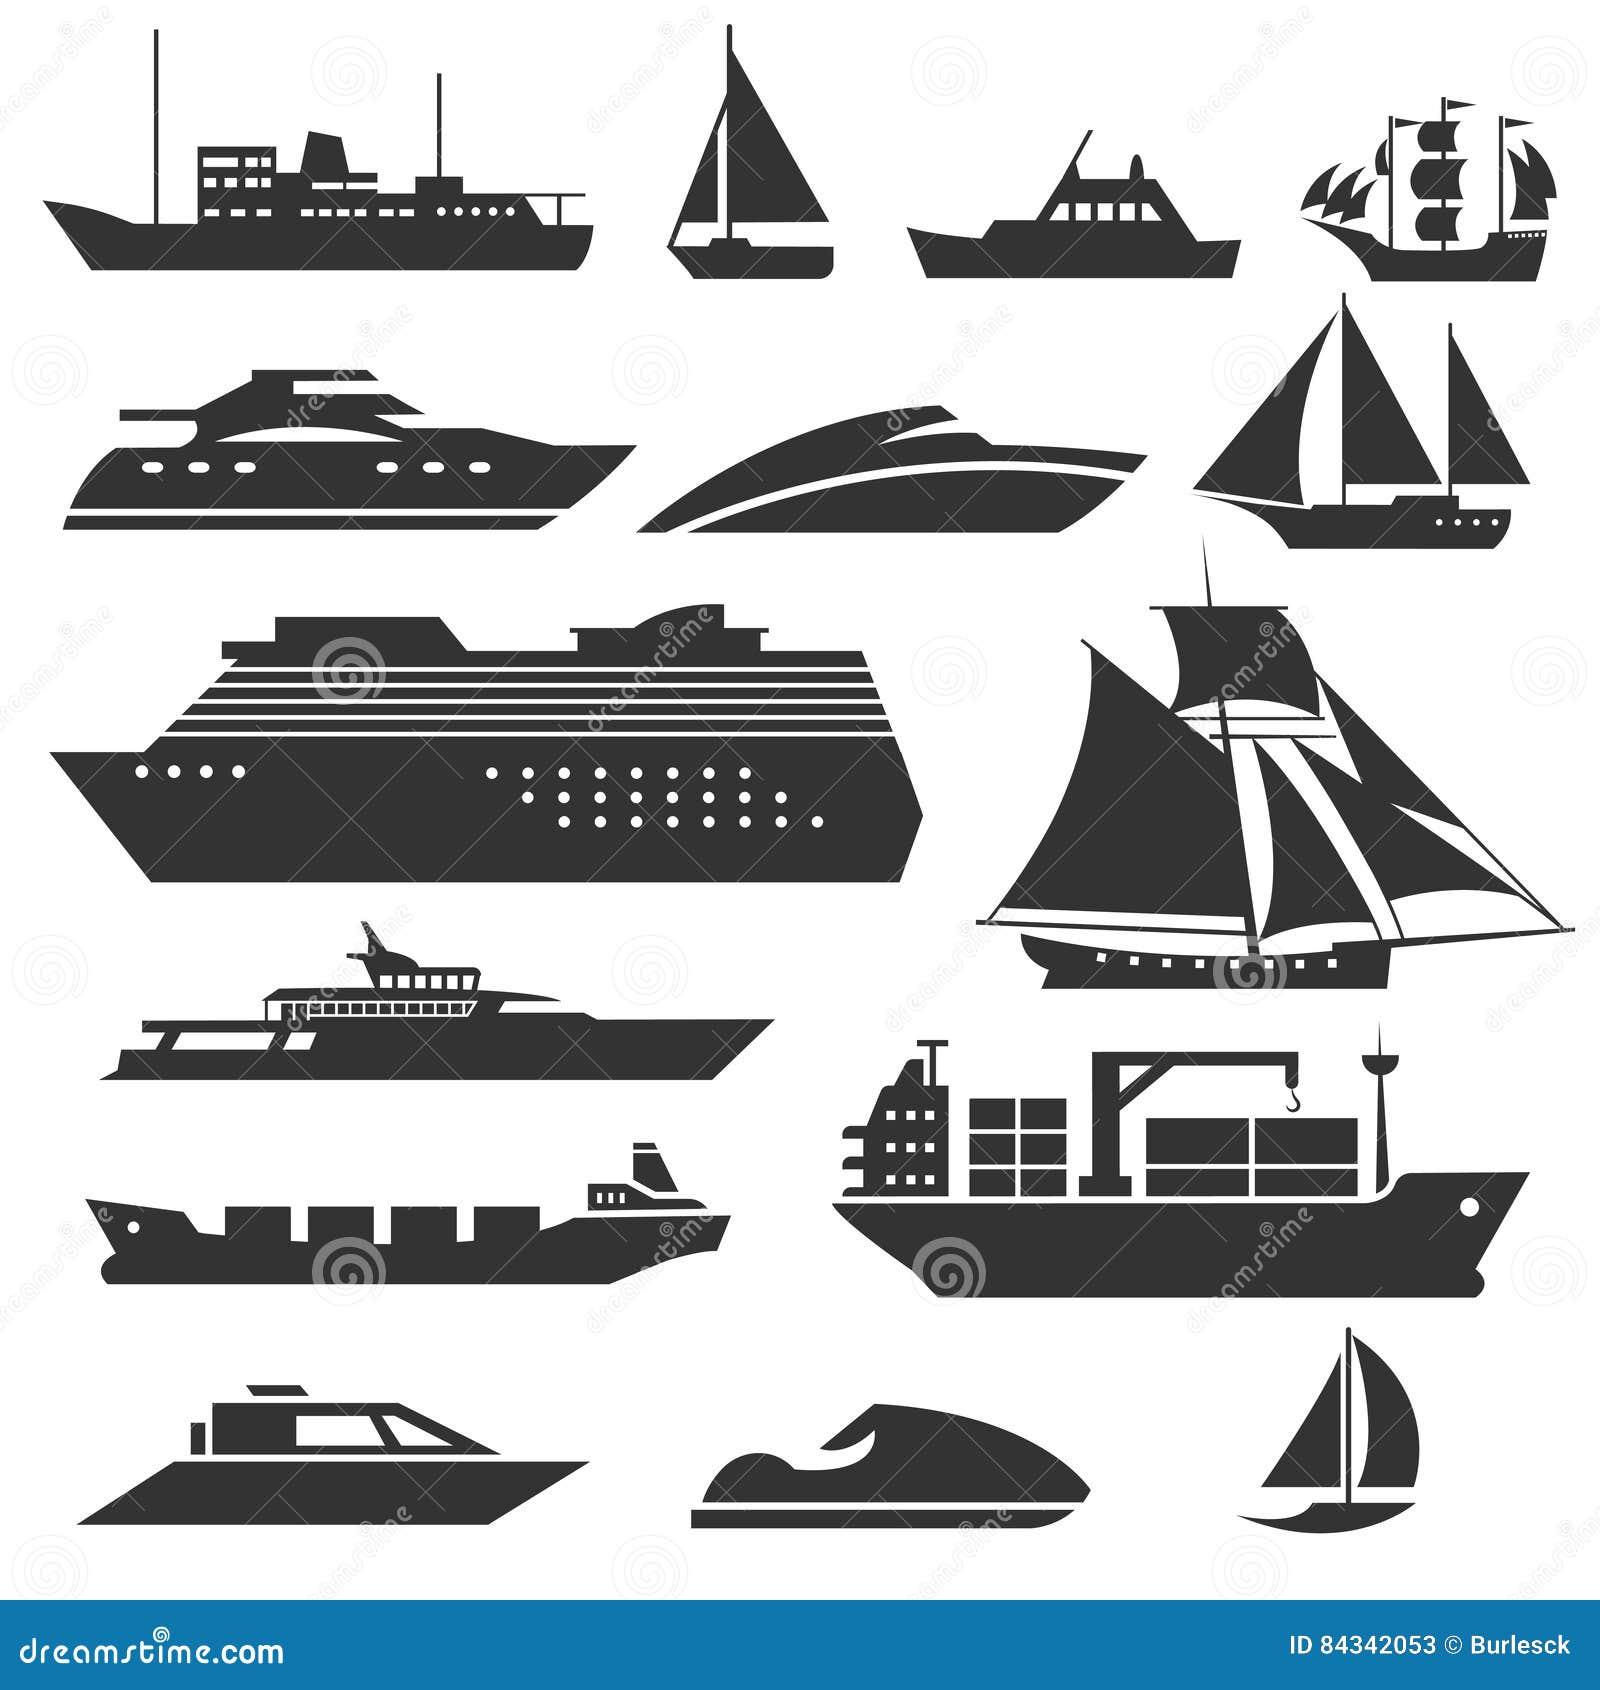 Ships and boats icons. Barge, cruise ship, shipping fishing boat vector signs